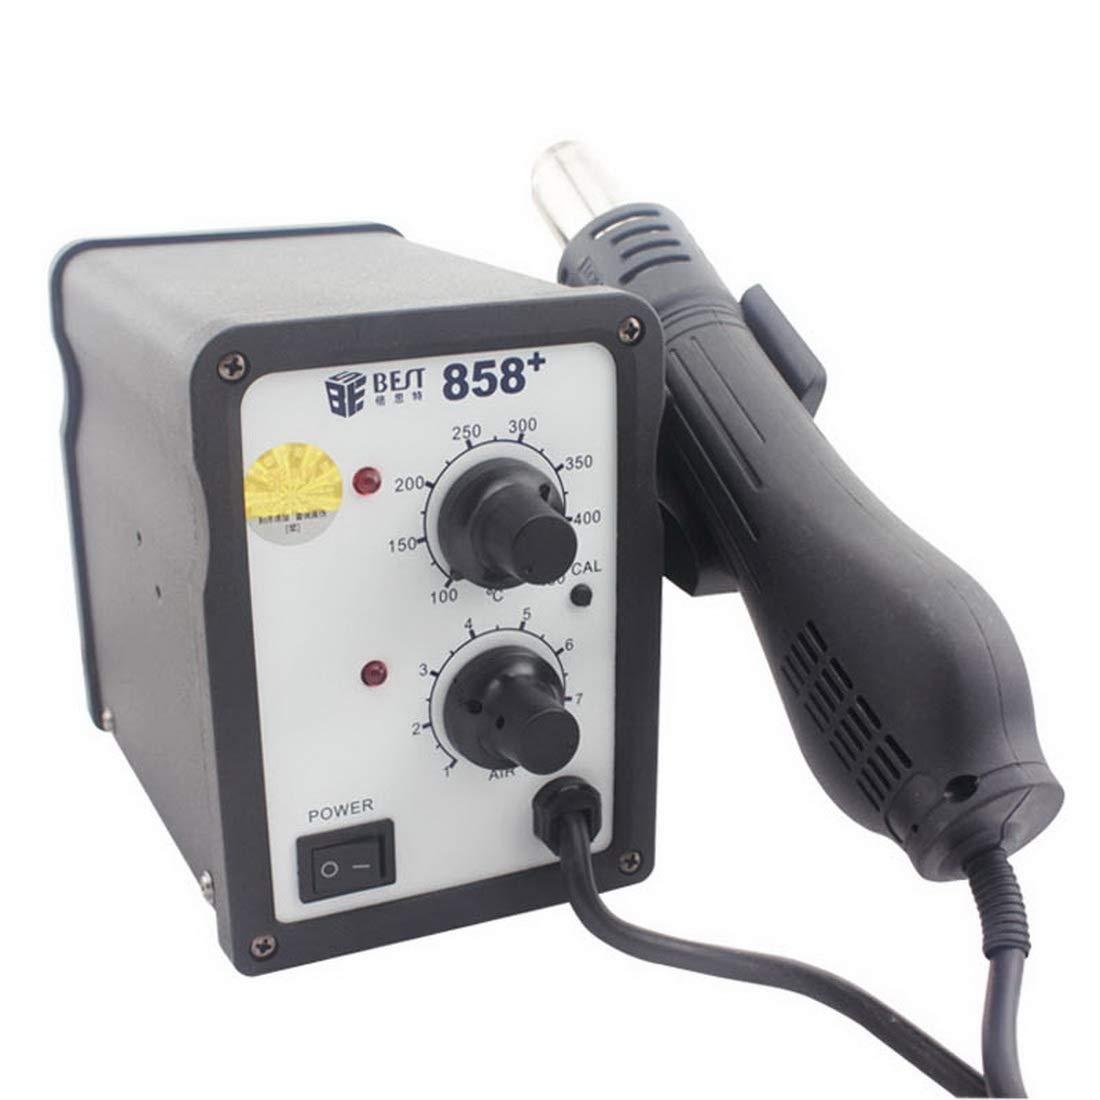 Toos Accessory BST-858+ AC 220V 50Hz 650W Adjustable Temperature Unleaded Hot Air Gun with Helical Wind, EU Plug Hand Tools (Color : S-etp-0240b)